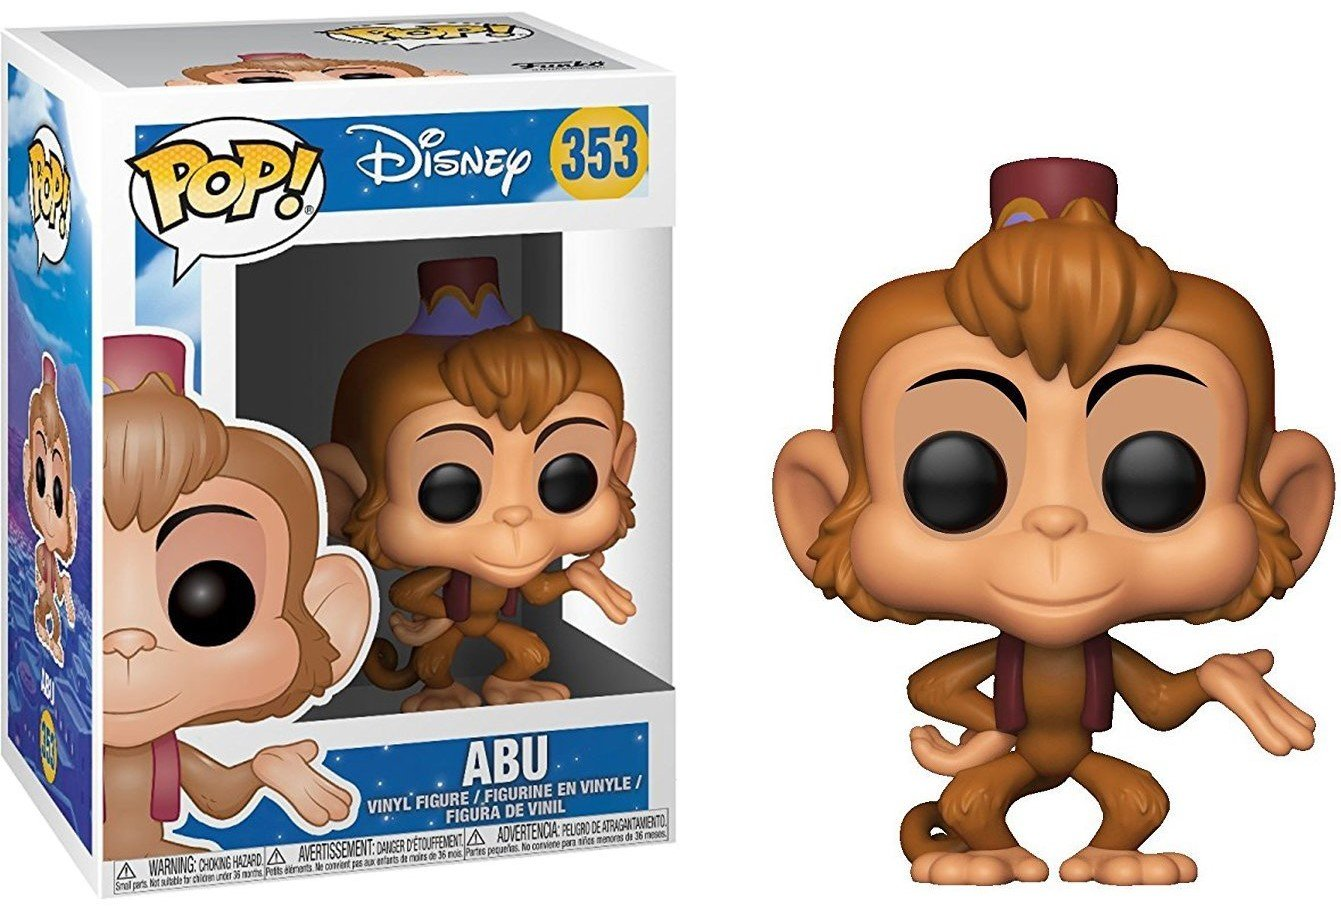 Funko Pop Abu Vinyl Figure Disney: Aladdin Bundled with Pop BOX PROTECTOR CASE